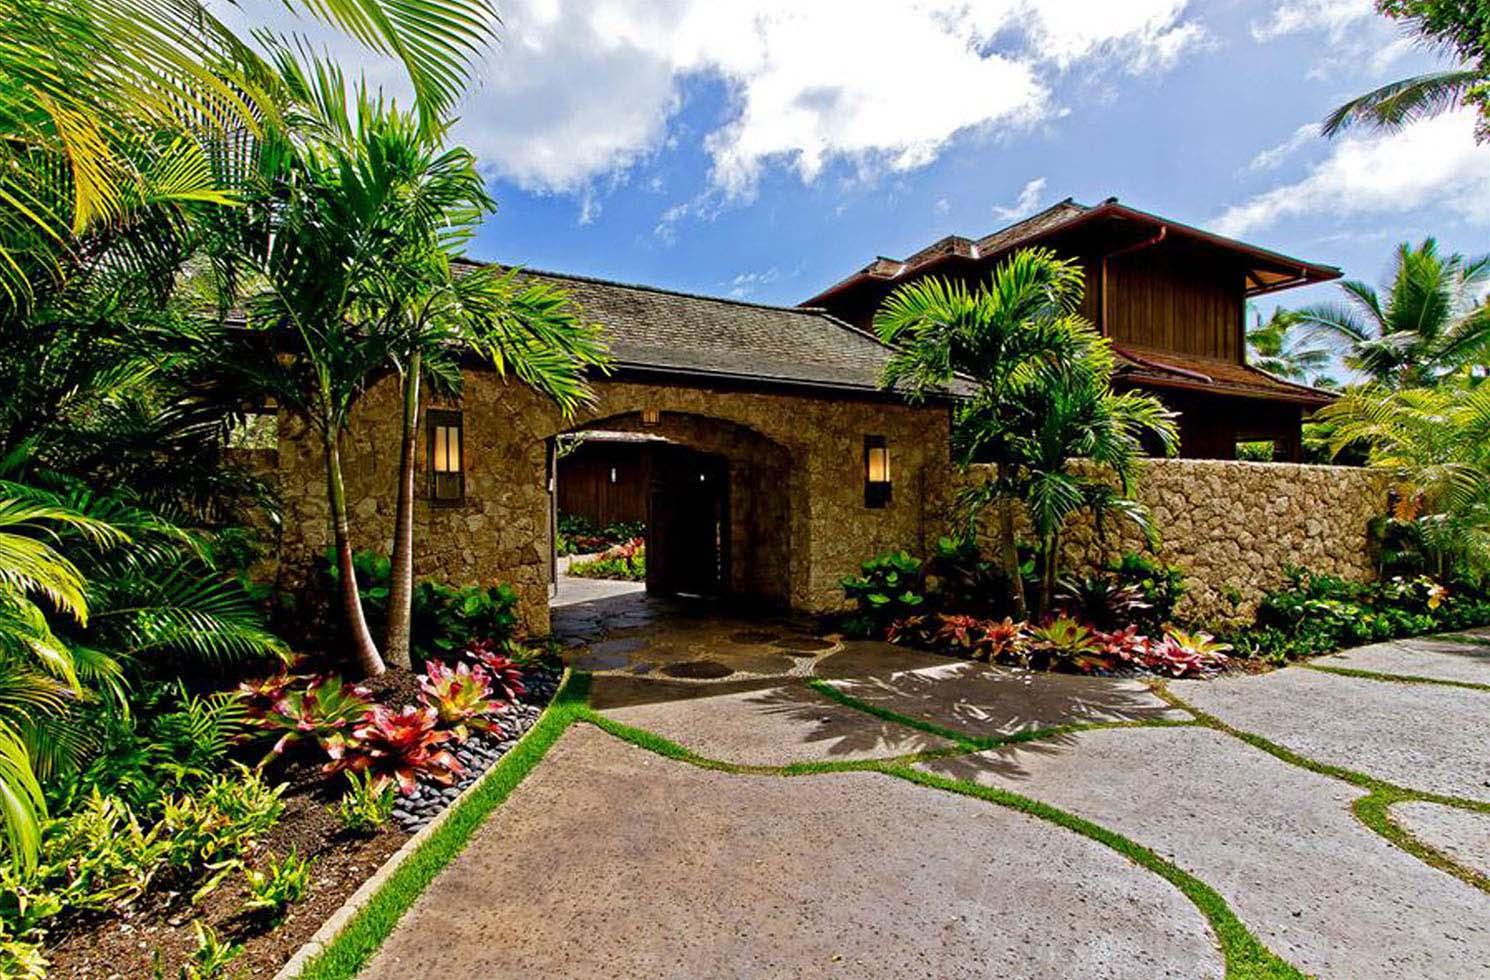 Kailua Beach Double Lot Oahu Kauai Landscape Architecture